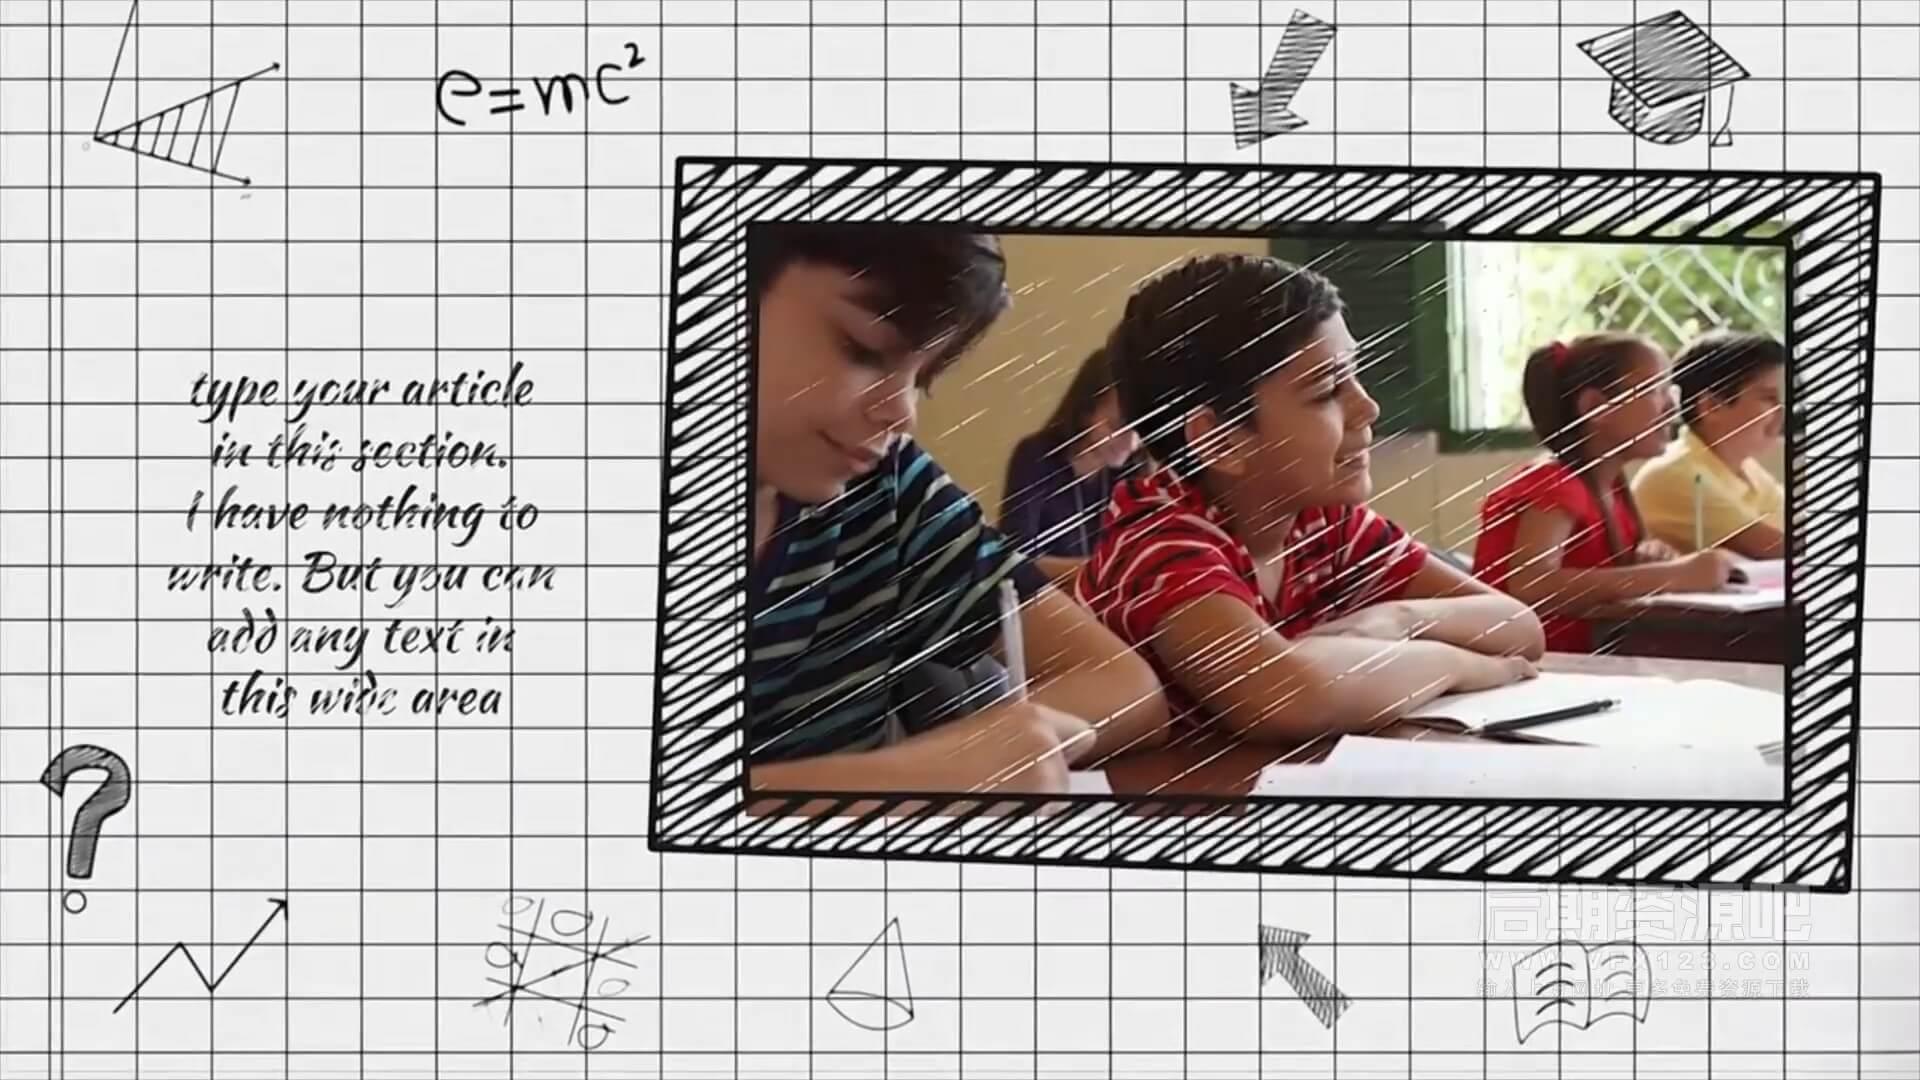 fcpx主题模板 卡通活力学校生活图片视频展示模板 School Life